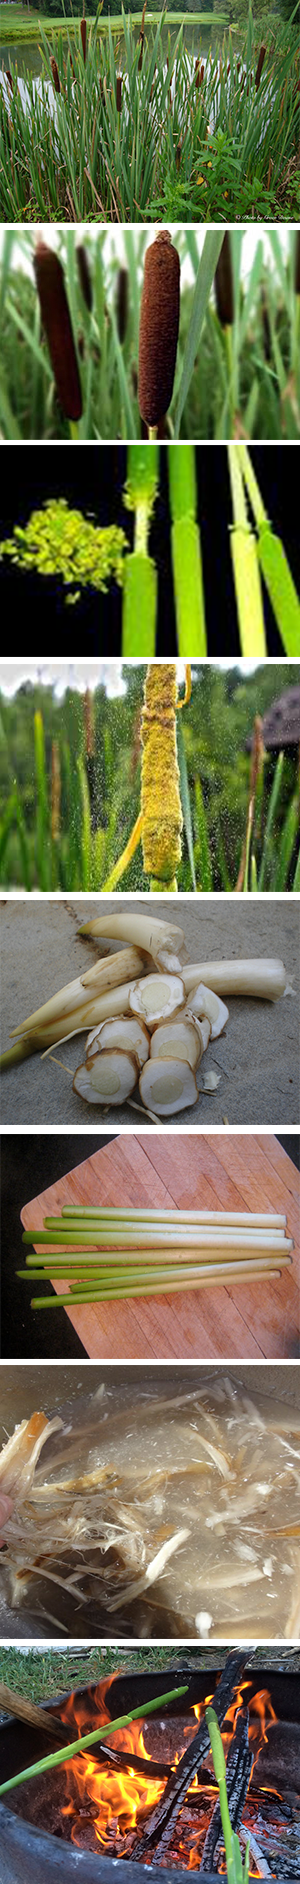 Blessingway Herbals Native Foods